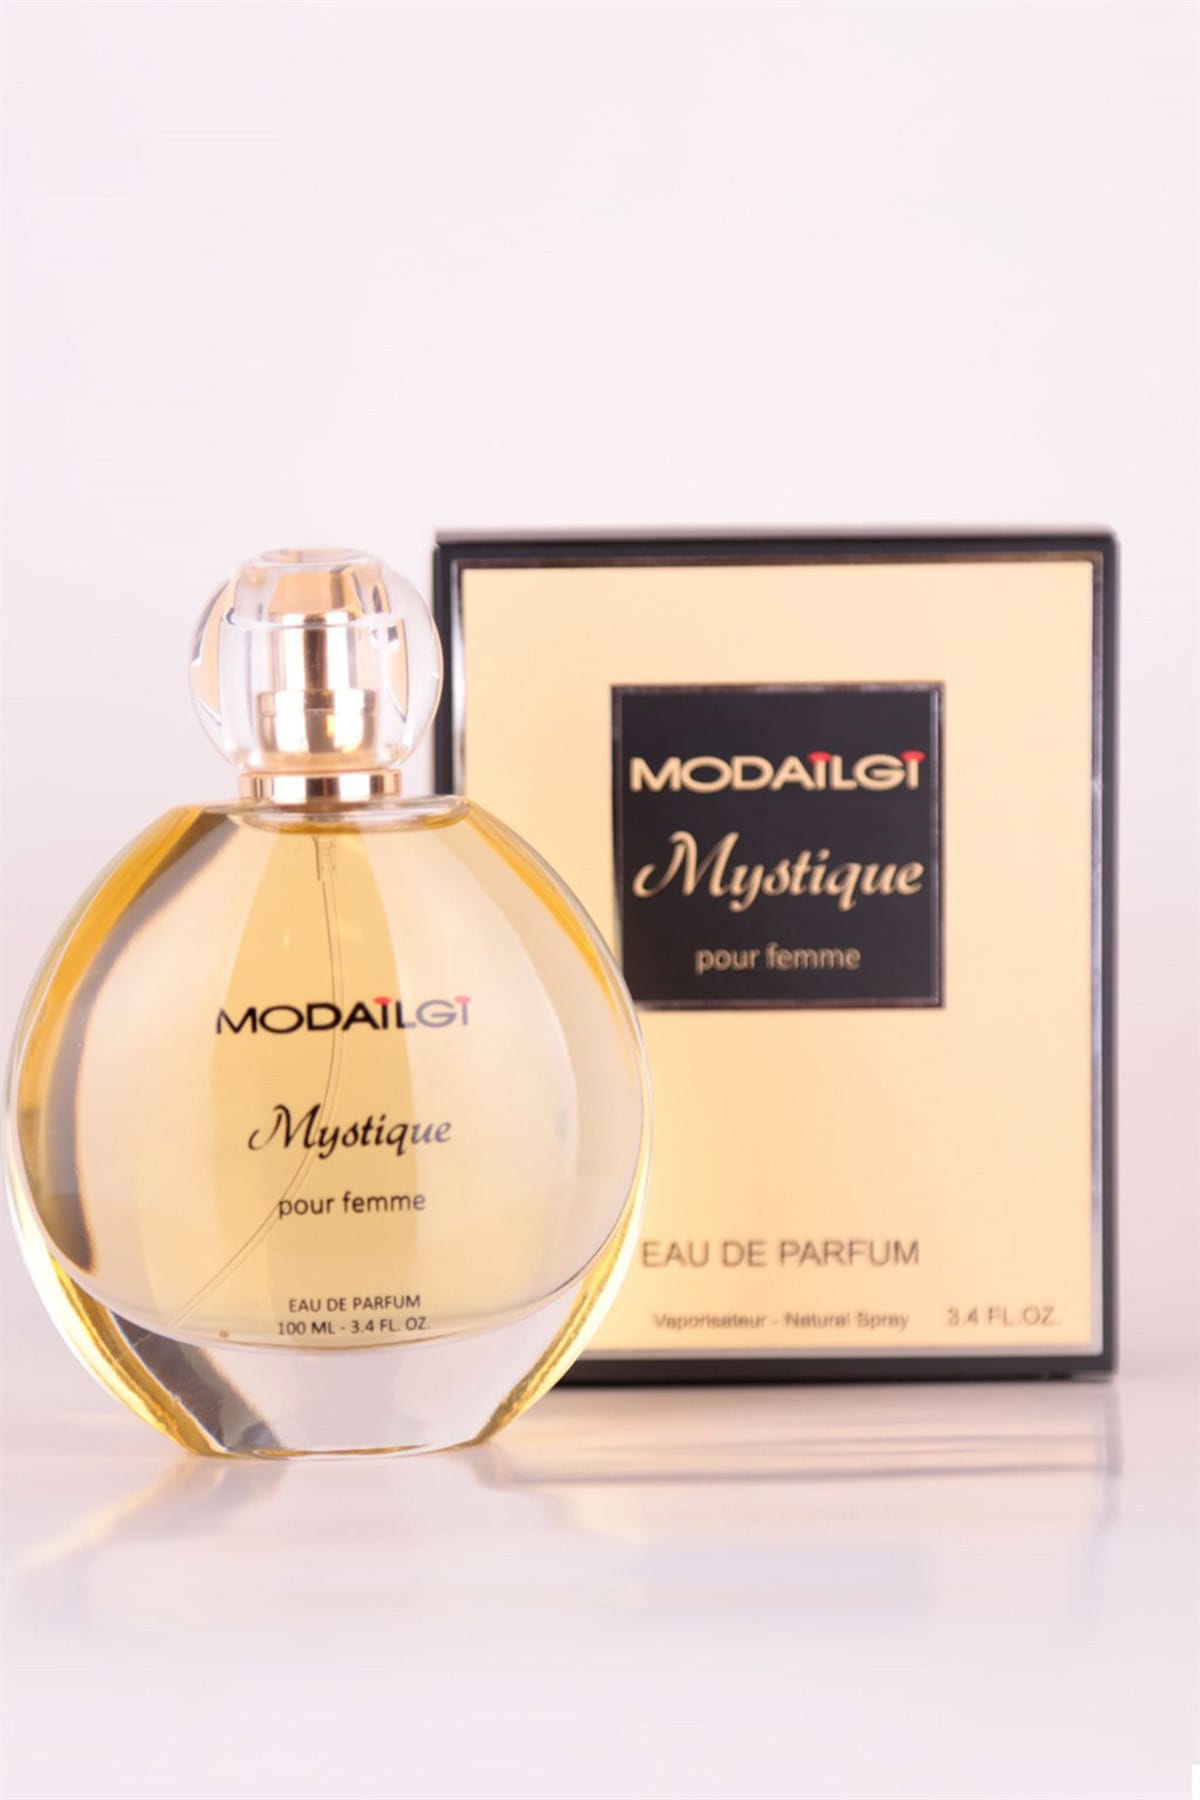 Moda İlgi Modailgi Mystique Parfume 1